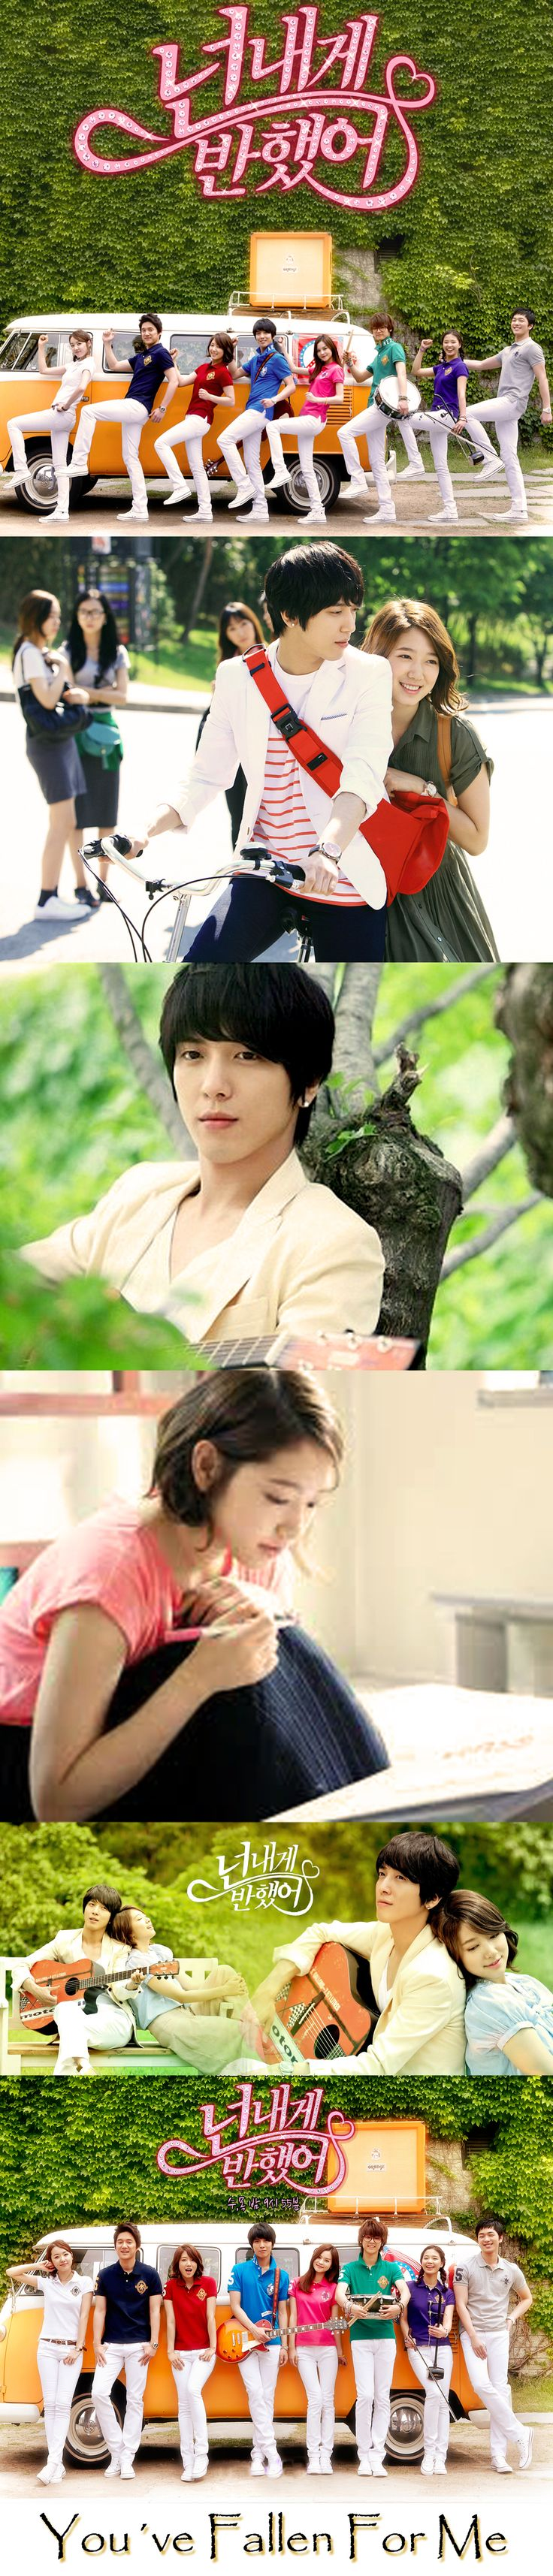 You´ve Fallen For Me ( also known Heartstrings) K drama 2011 - 15 episodes - Park Shin Hye / Jung Yong Hwa / Song Chang Ui / So Yi Hyun